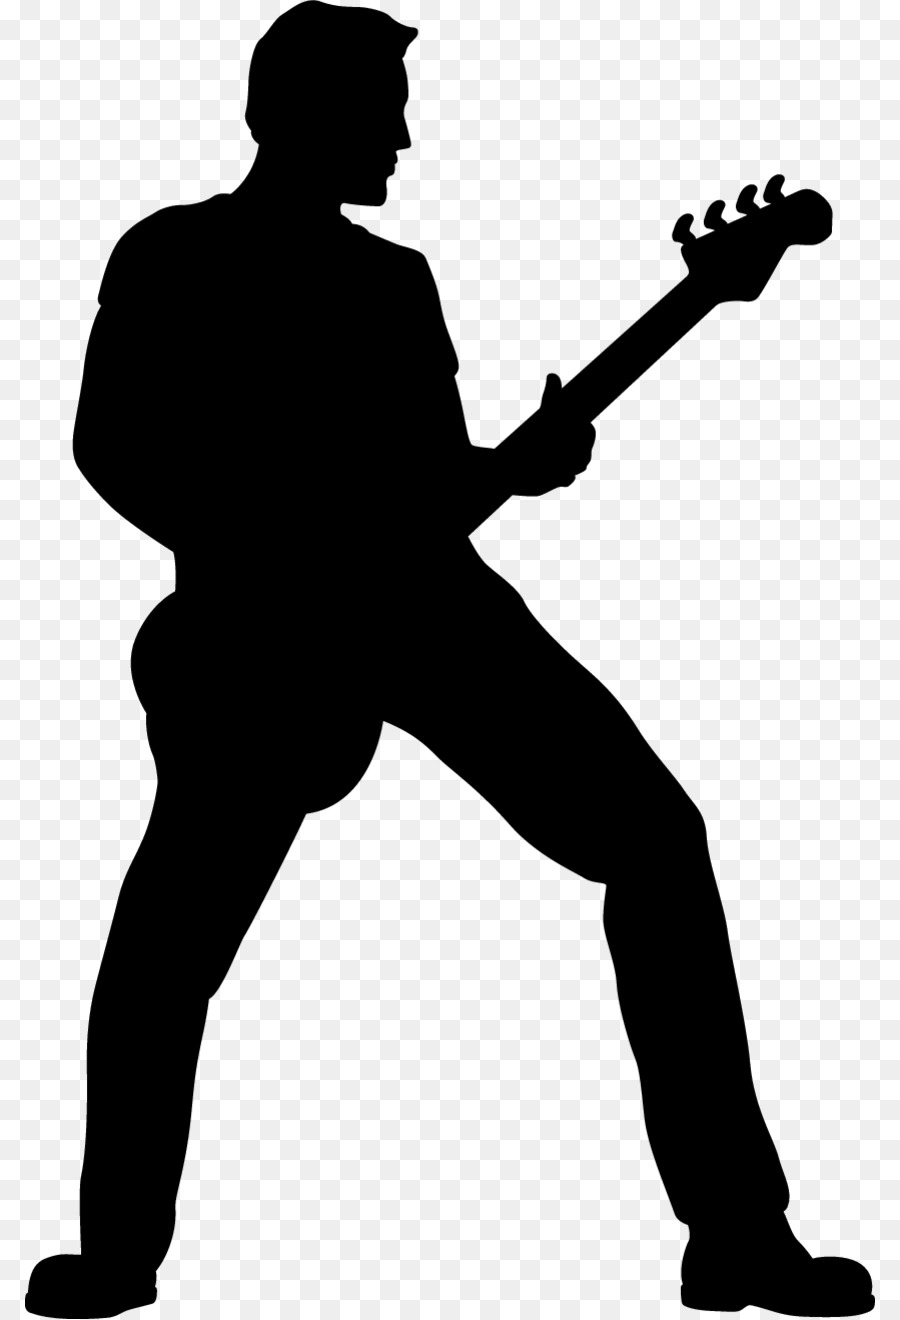 900x1320 Guitarist Silhouette Clip Art